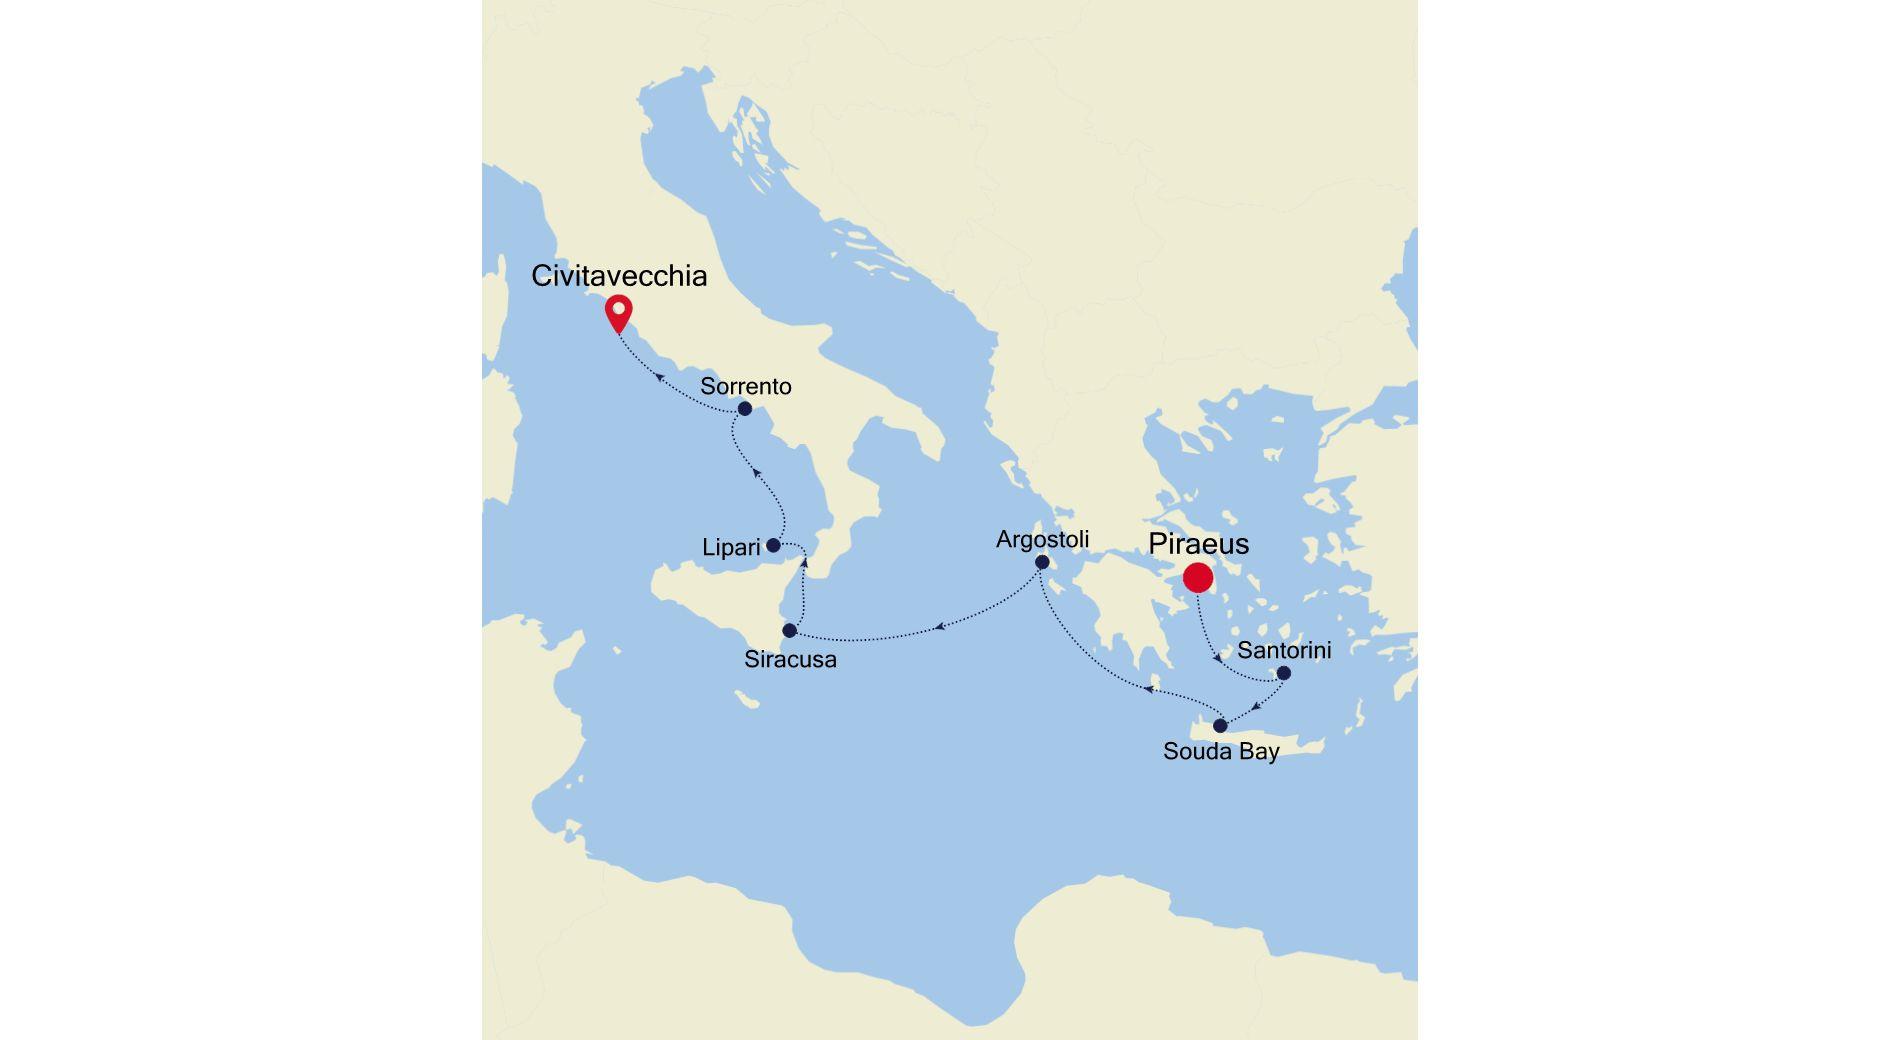 MO210517007 - Piraeus a Civitavecchia